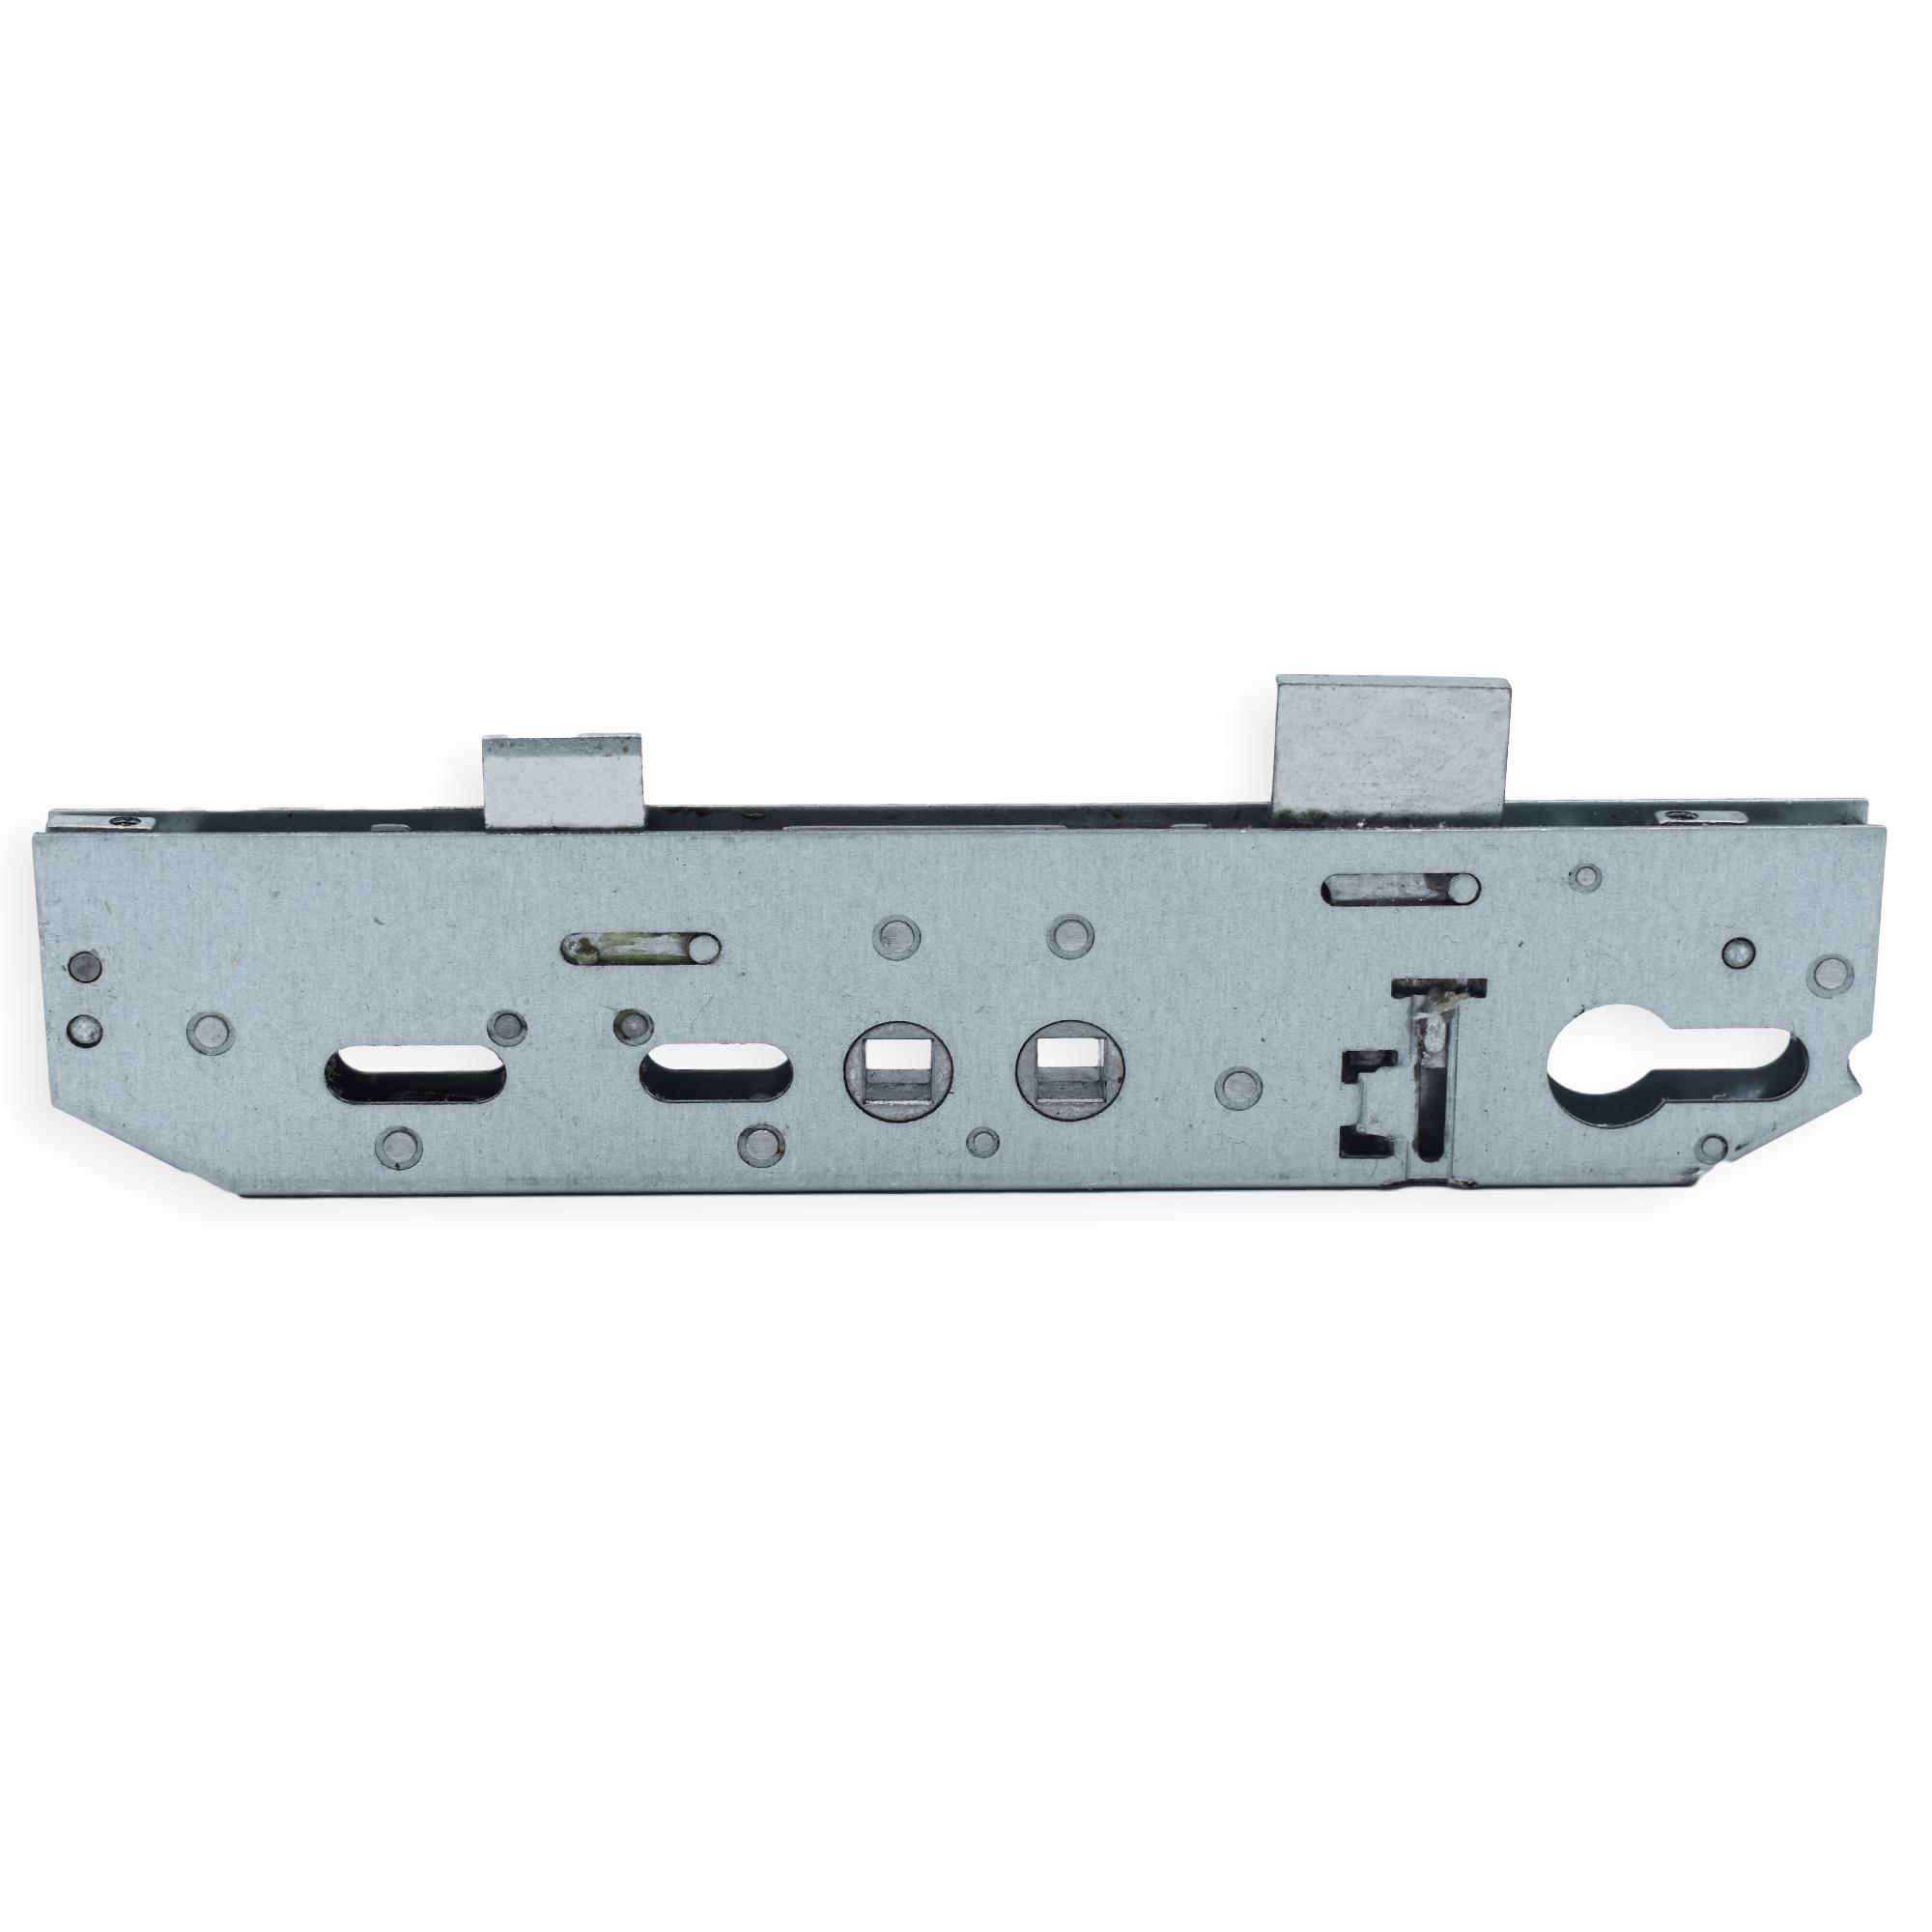 35mm Backset Lever Operated Genuine Mila Coldseal Upvc Door Lock Gearbox